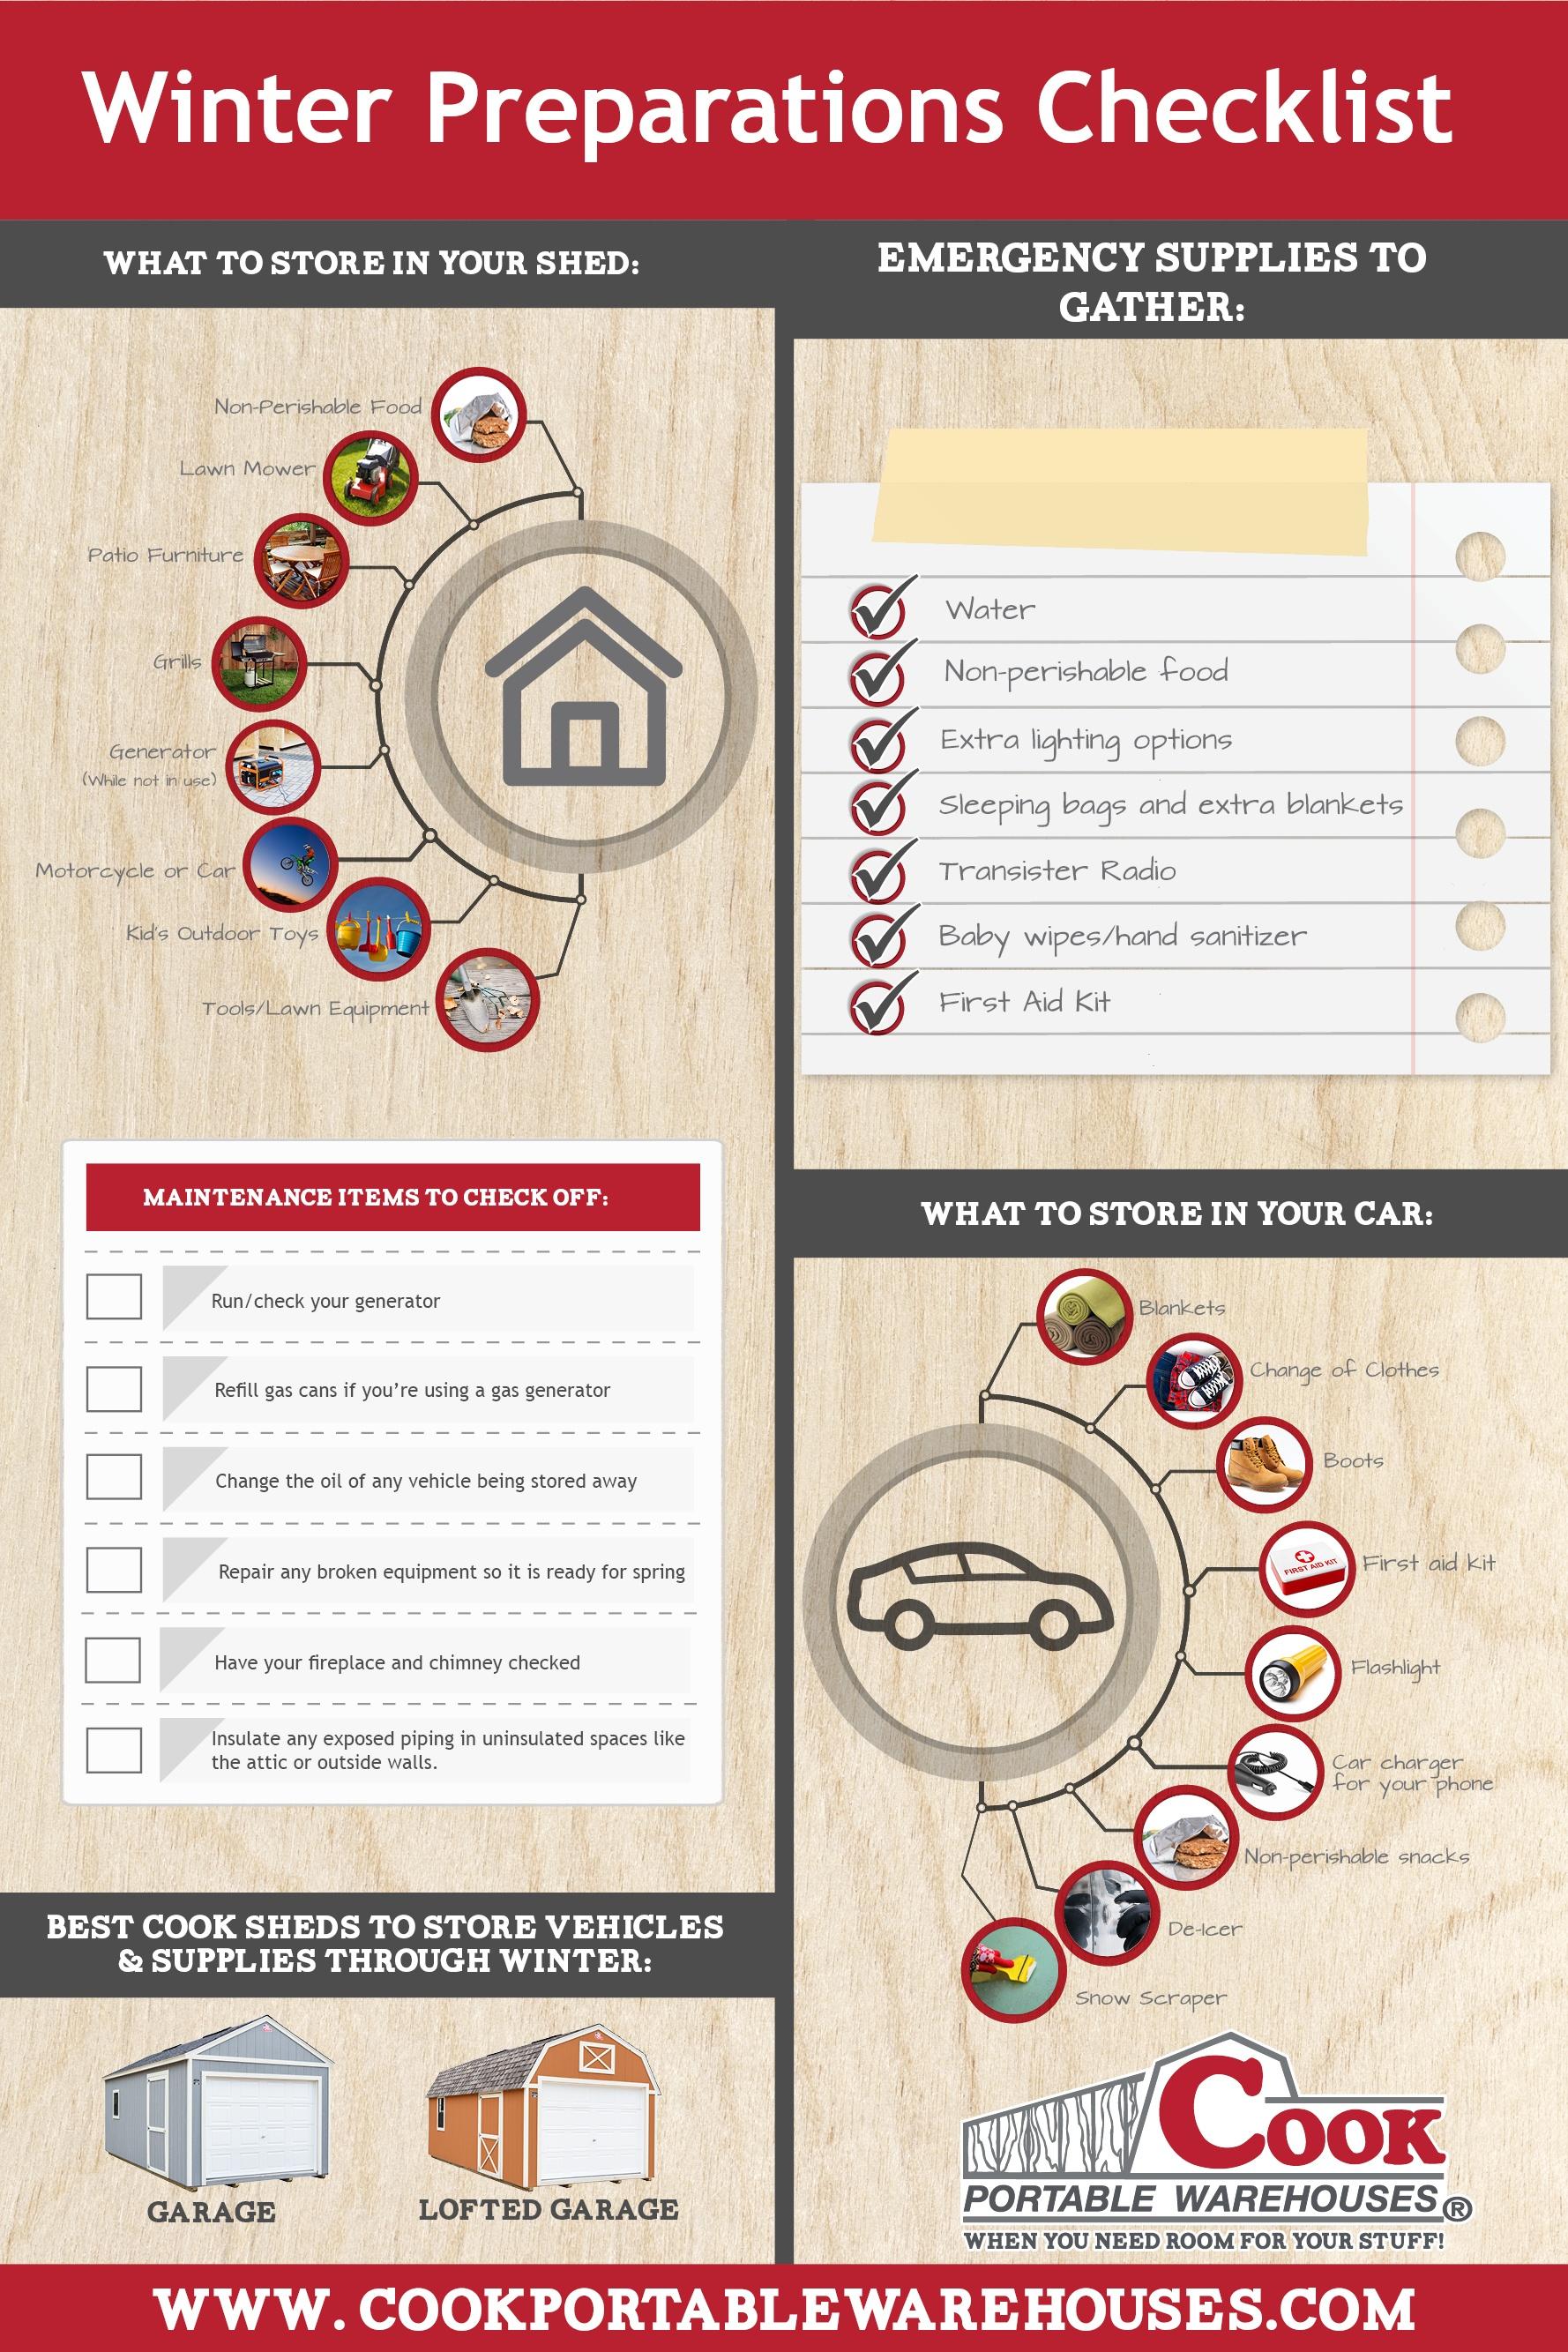 Emergency Preparedness Infographic + Cook Portable Warehouses